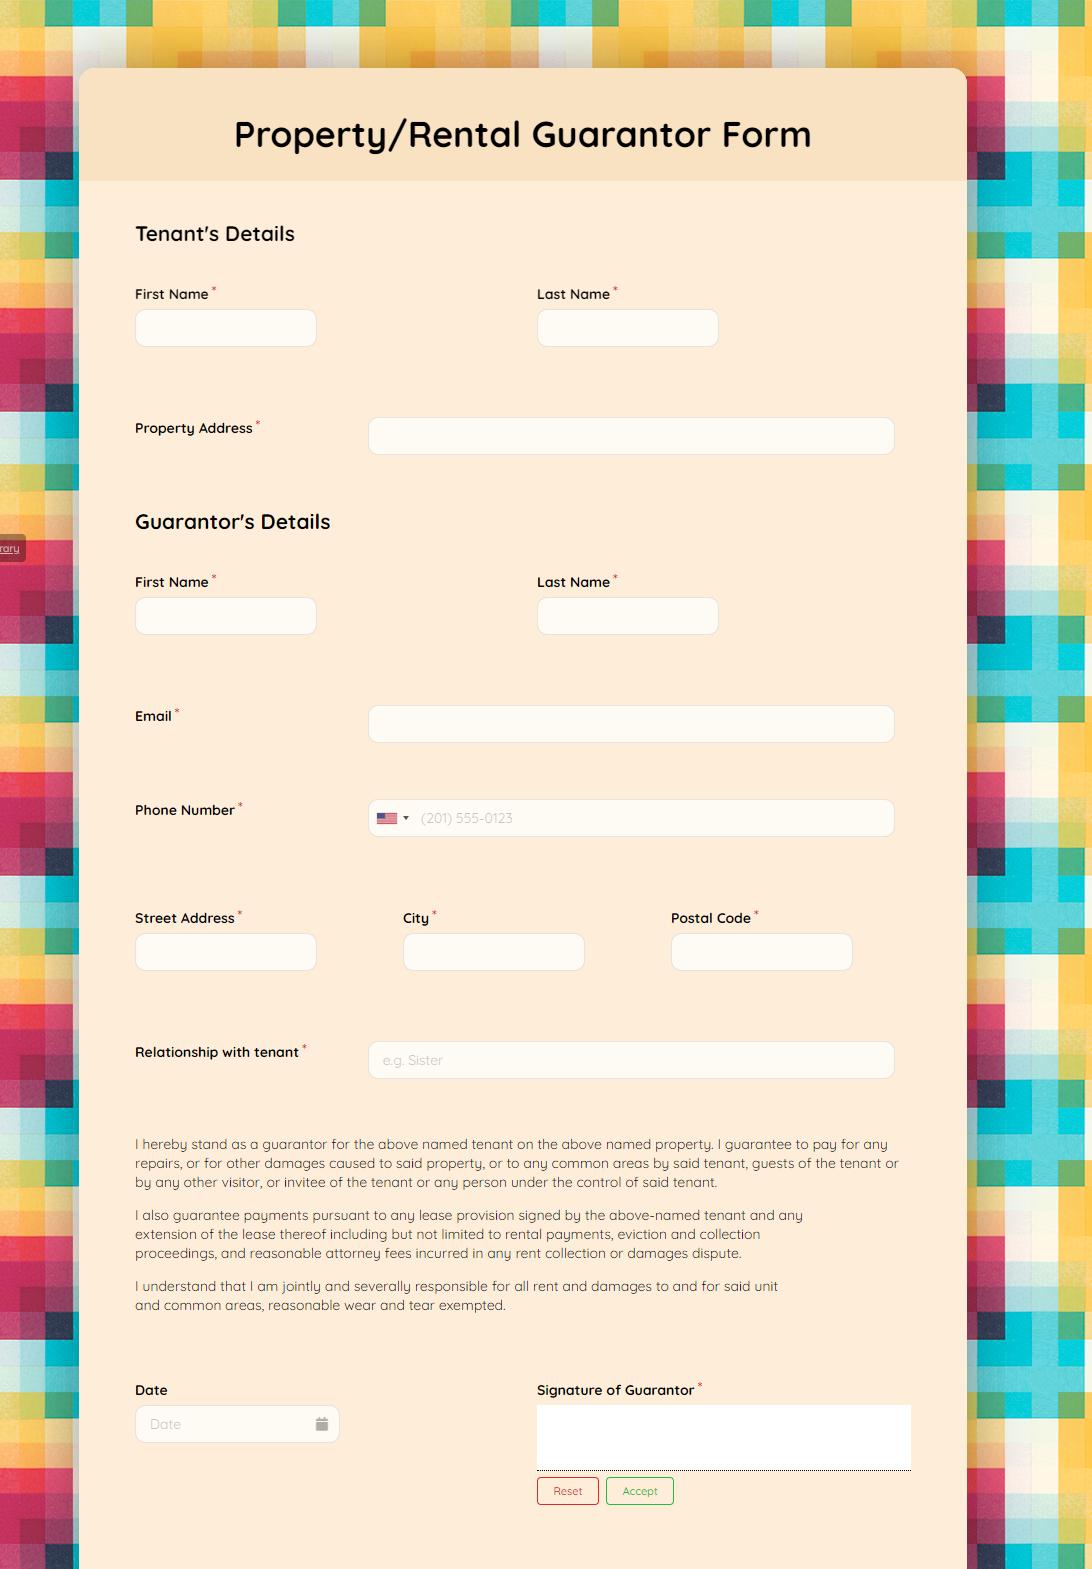 Property Rental Guarantor Form template